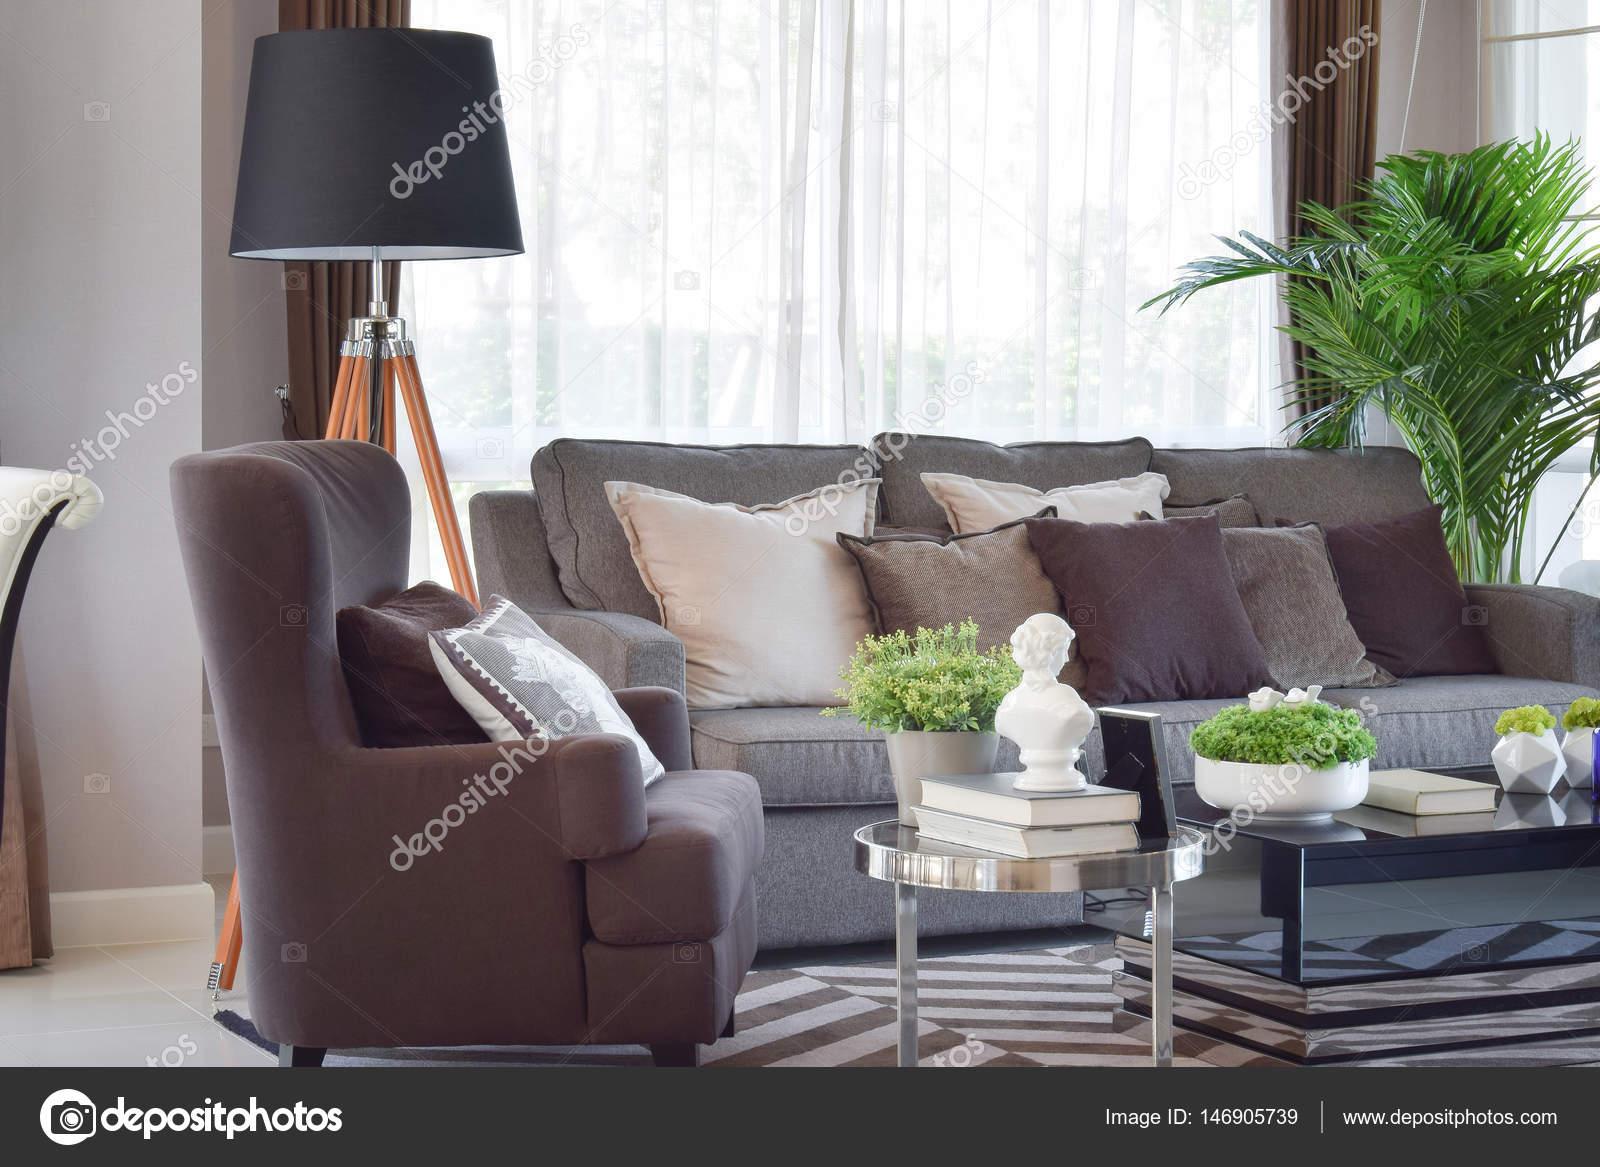 Stile europeo imbottita loveseat divano a due posti divano mobili